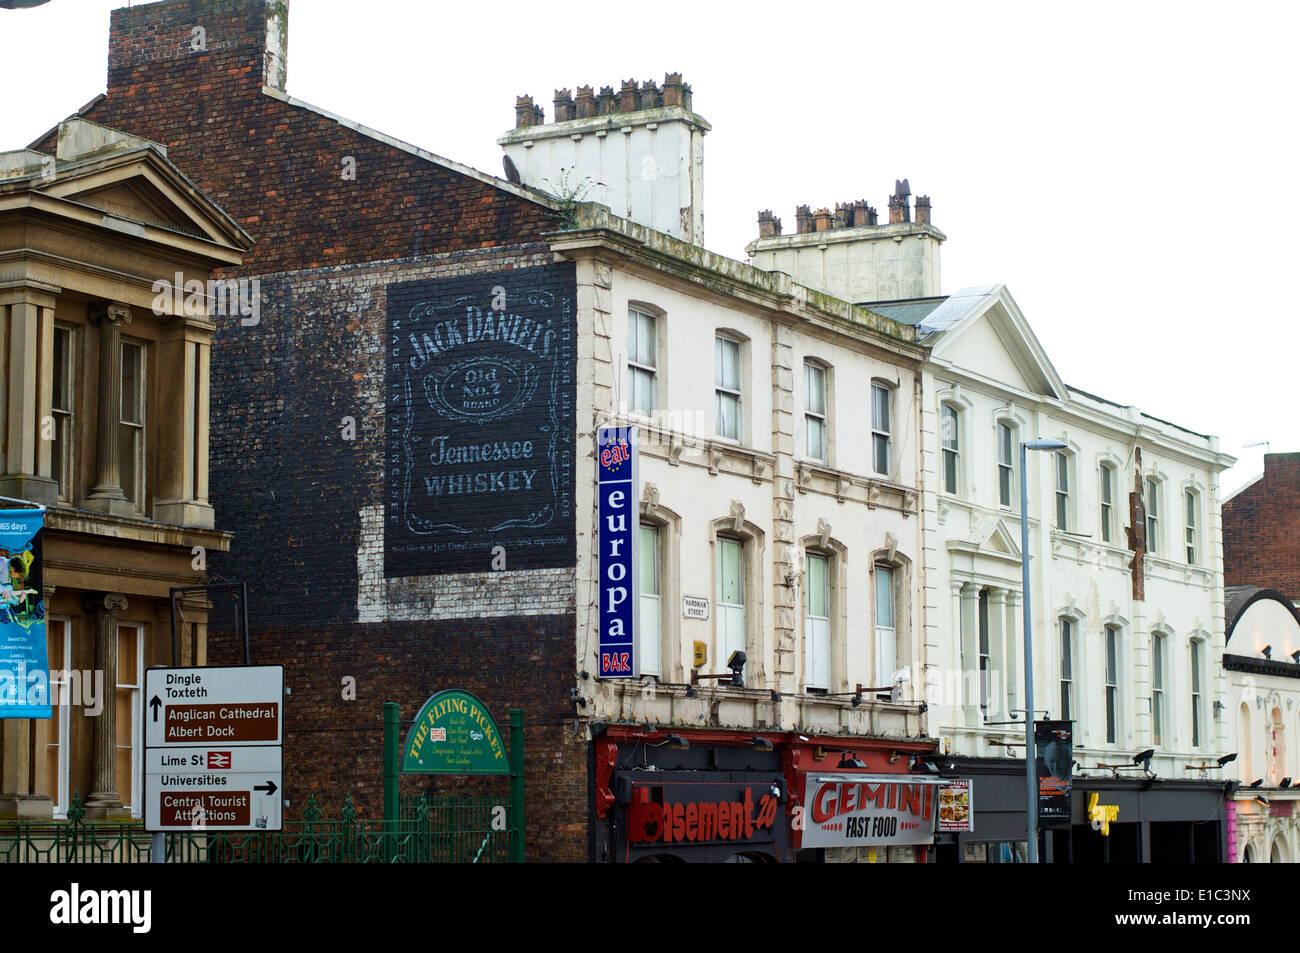 Bars In Old Georgian Houses, Hardman Street,Liverpool,UK